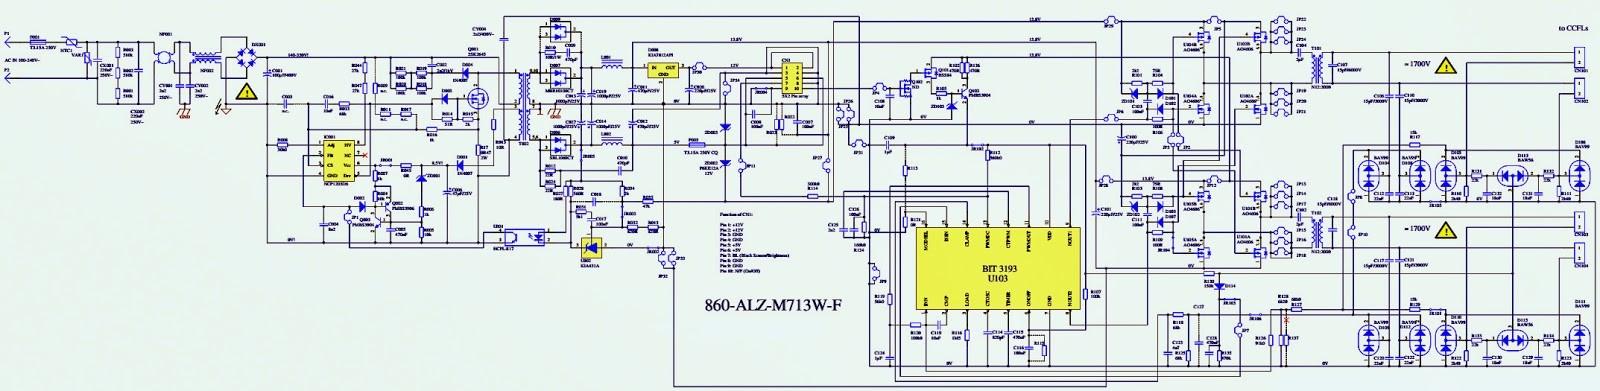 Fujitsu Ctm5020 Monitor Schematics Diagrams Electro Help 860 Alz M713w F Power Supply & Inverter Schematic Circuit Diagram Of Fujitsu Ctm5020 Monitor Schematics Diagrams